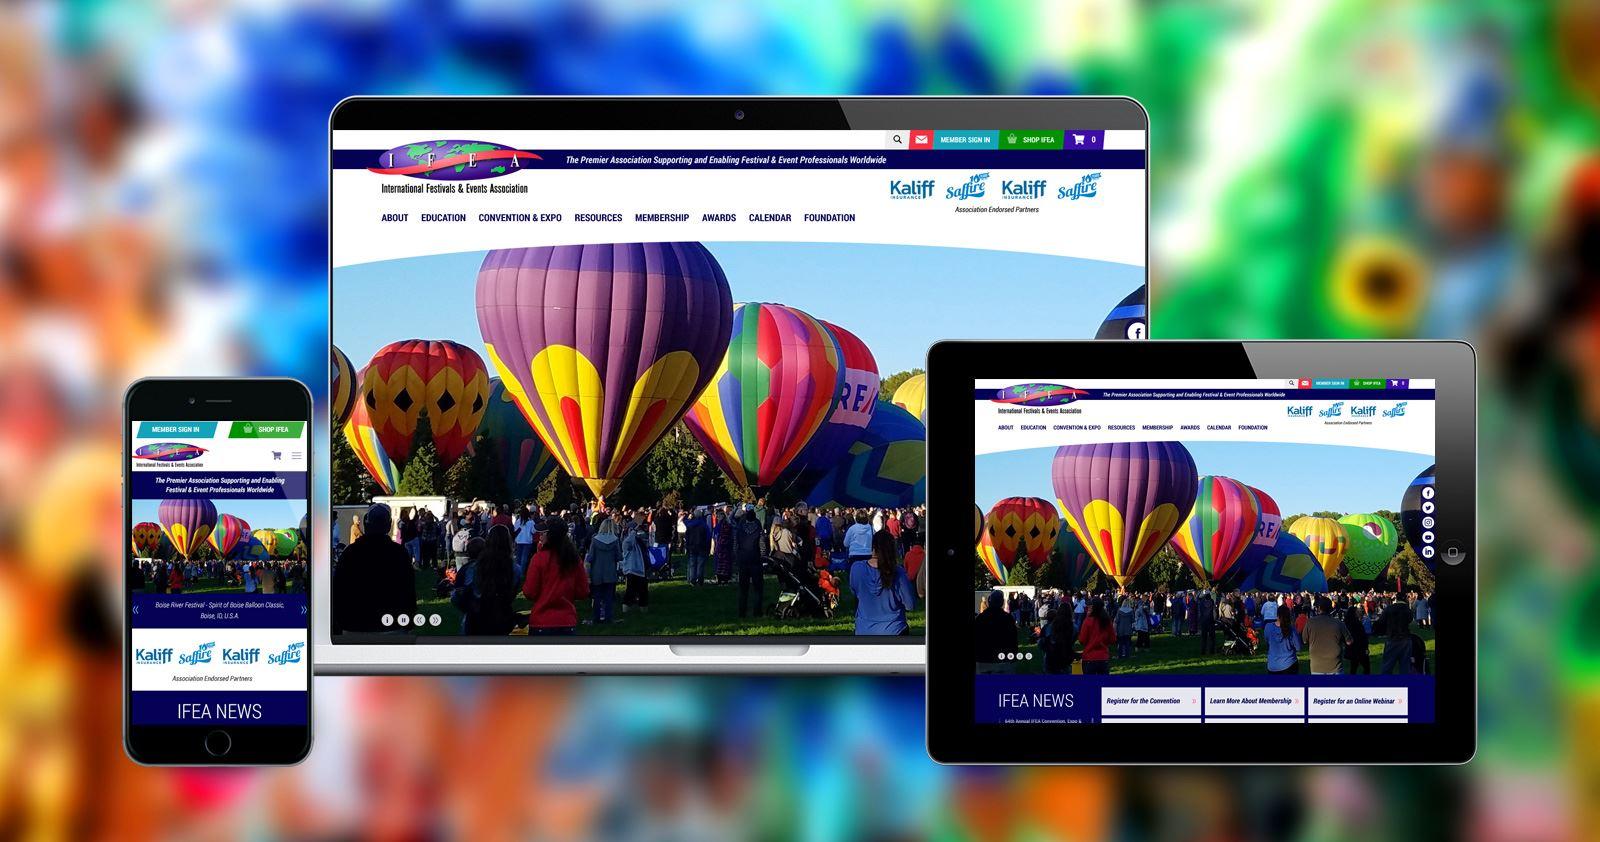 International Festivals & Events Association